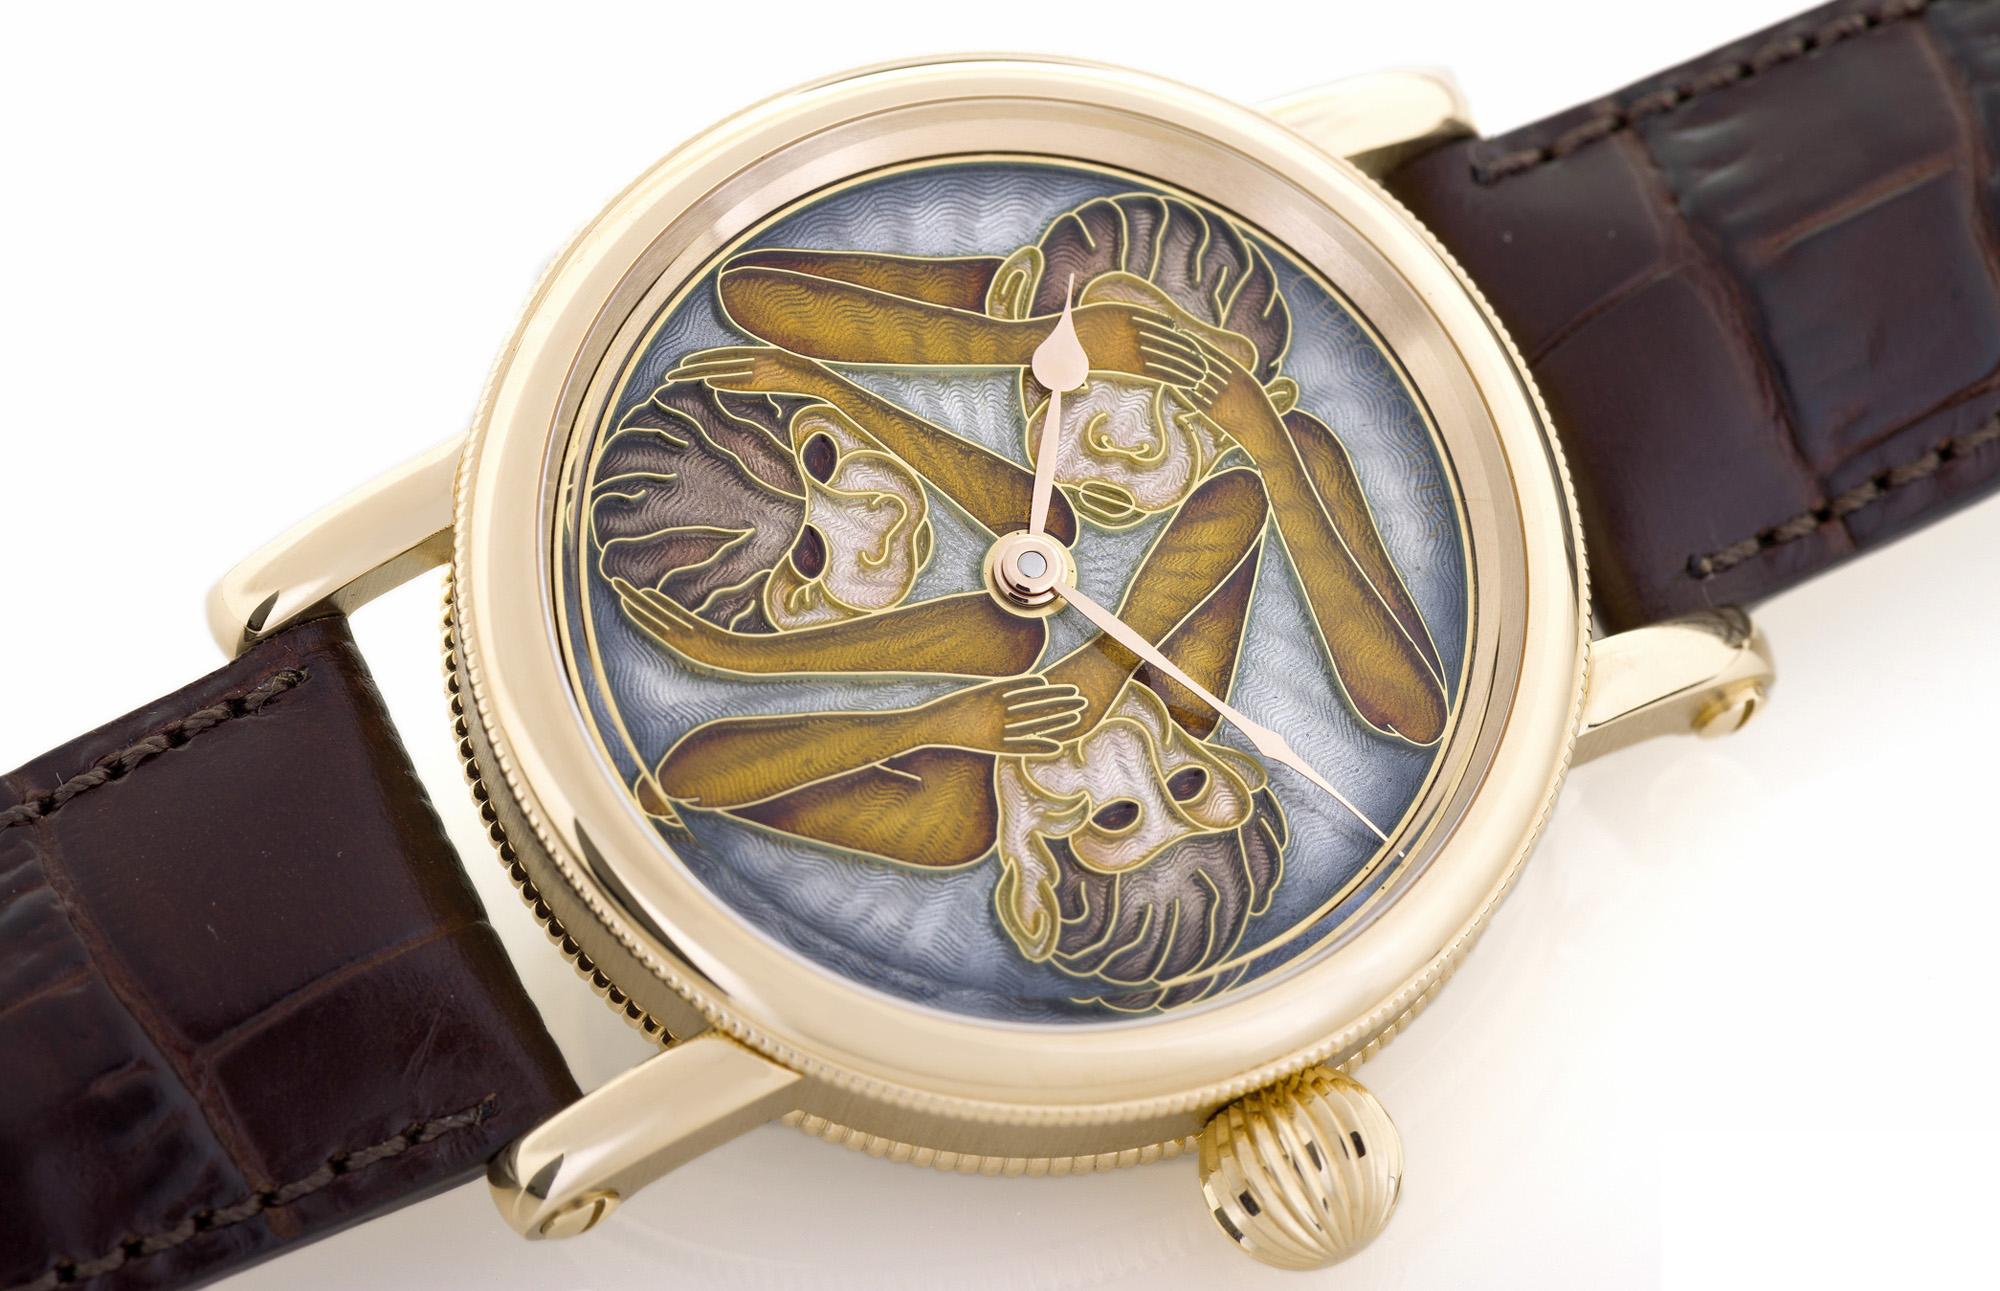 Chronoswiss The Three Apes - Watch